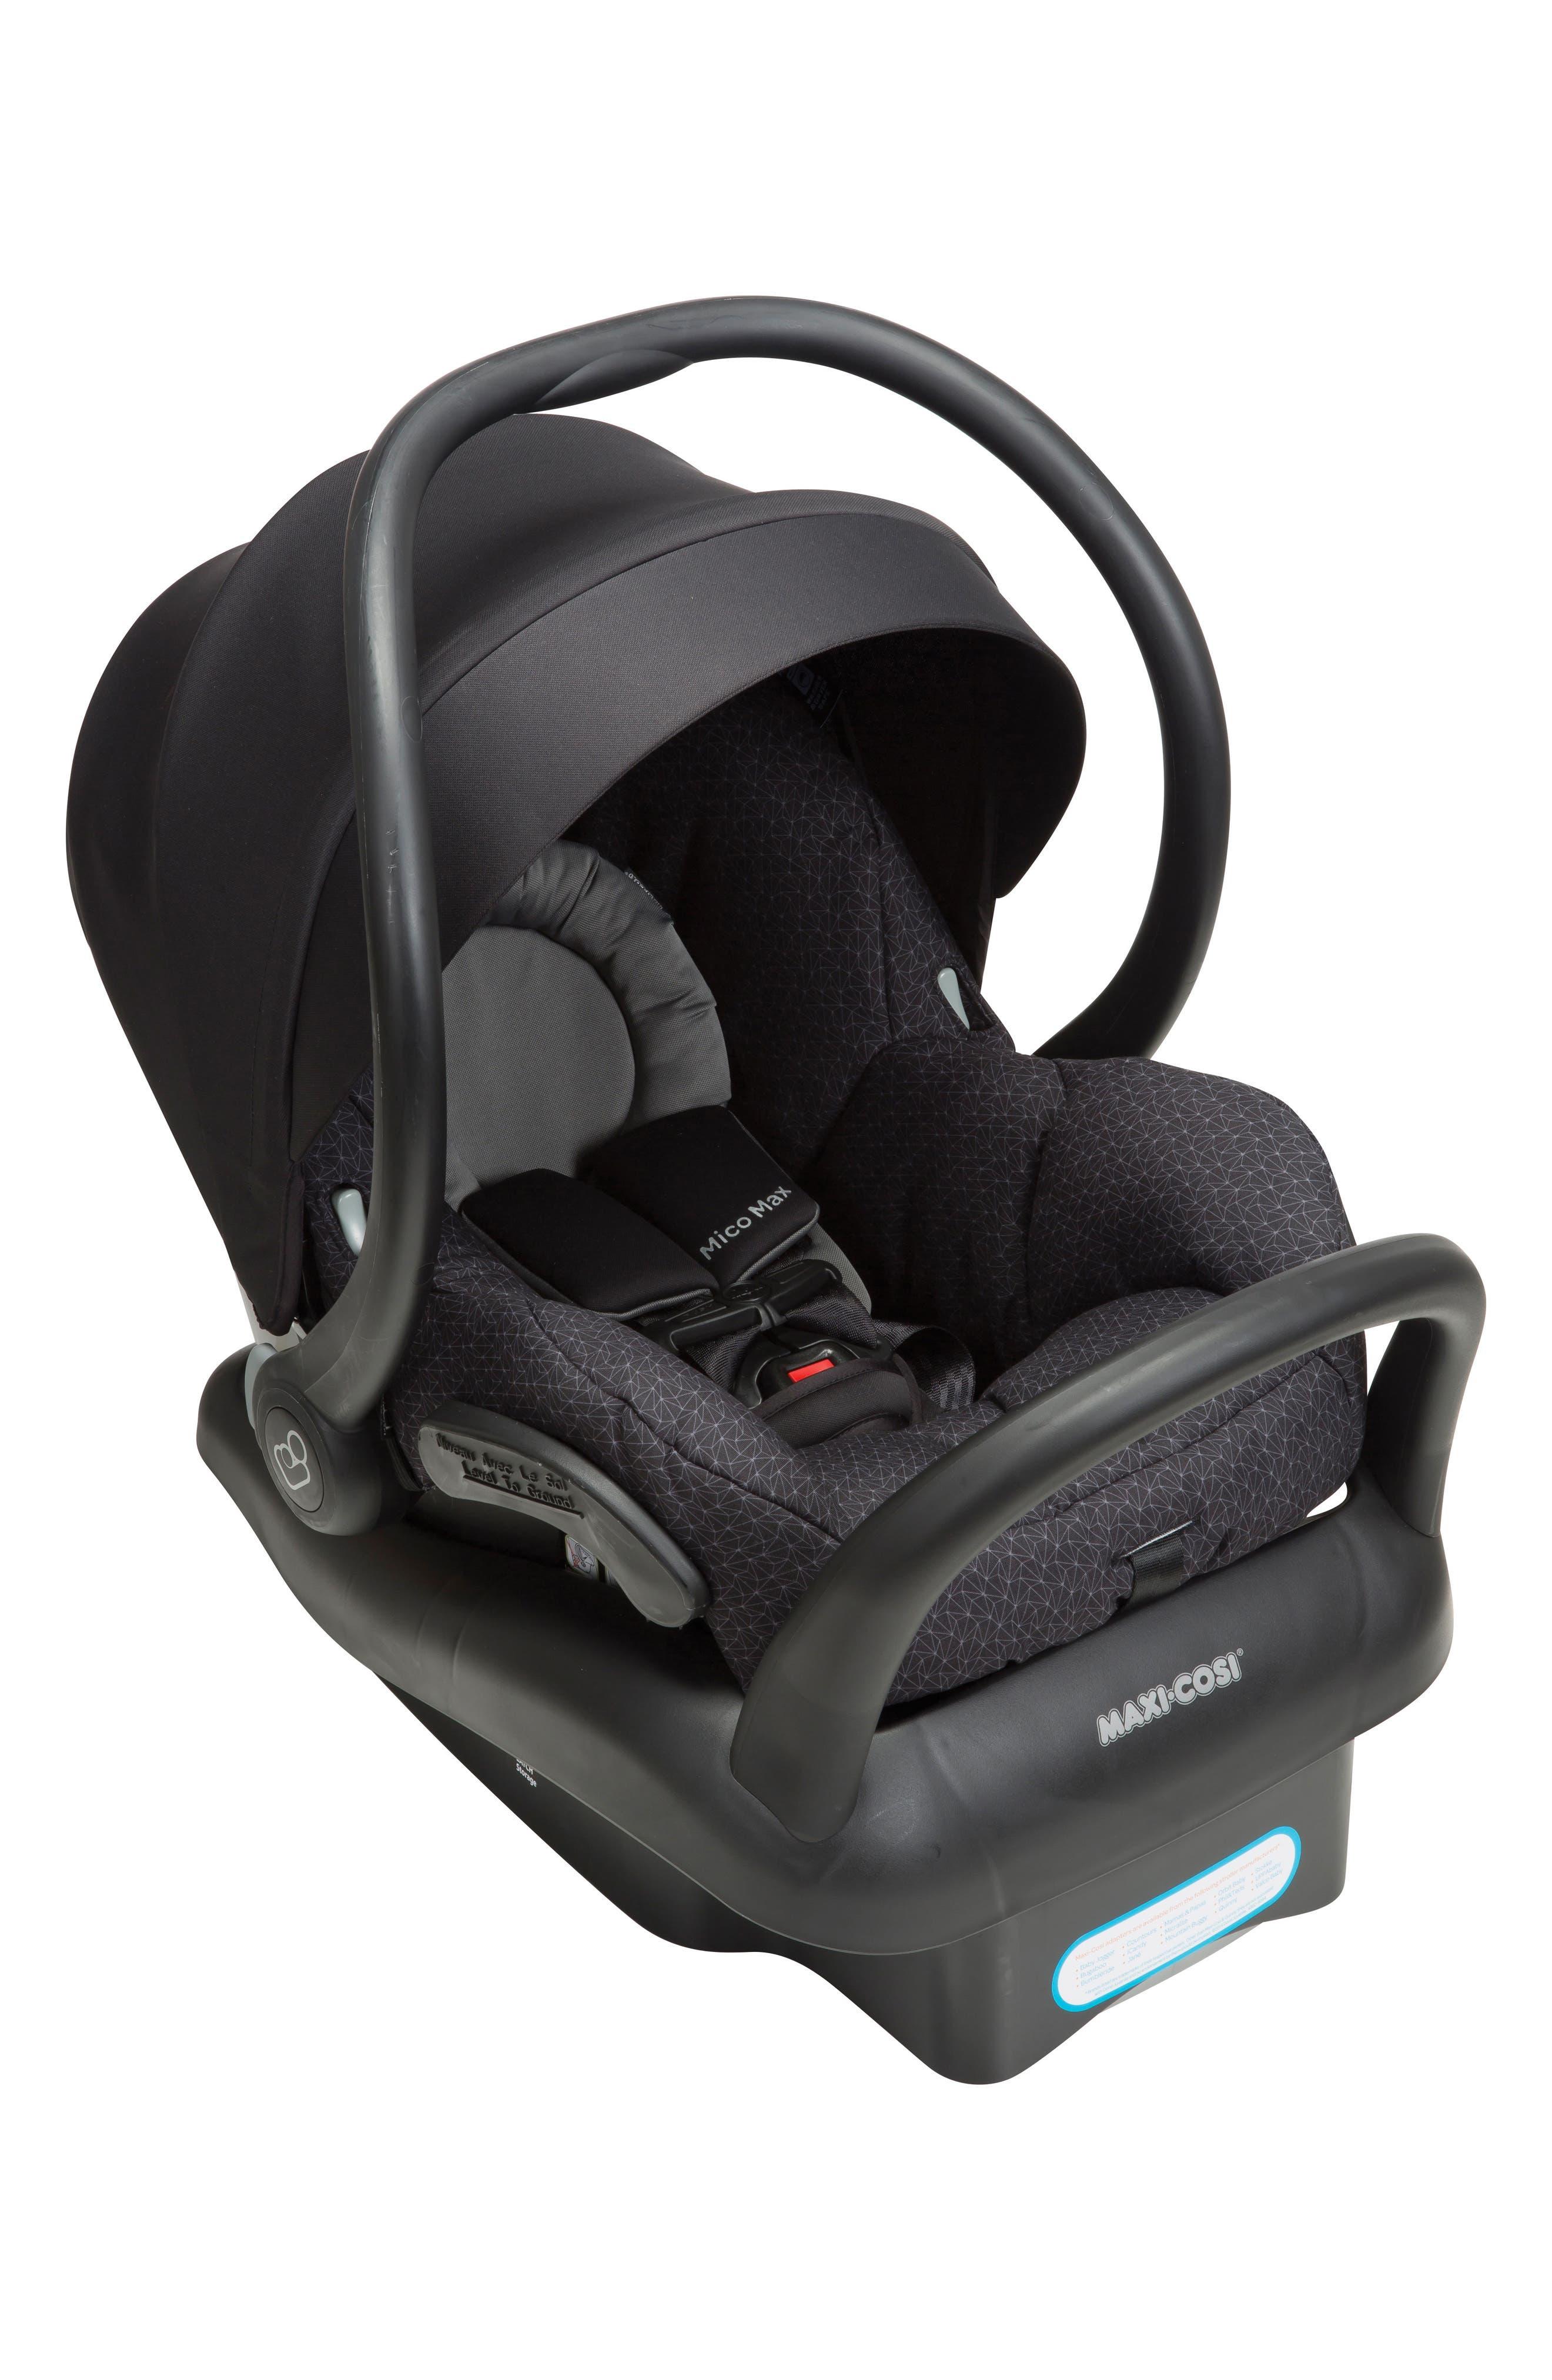 Mico Max 30 Infant Car Seat,                             Main thumbnail 1, color,                             BLACK CRYSTAL